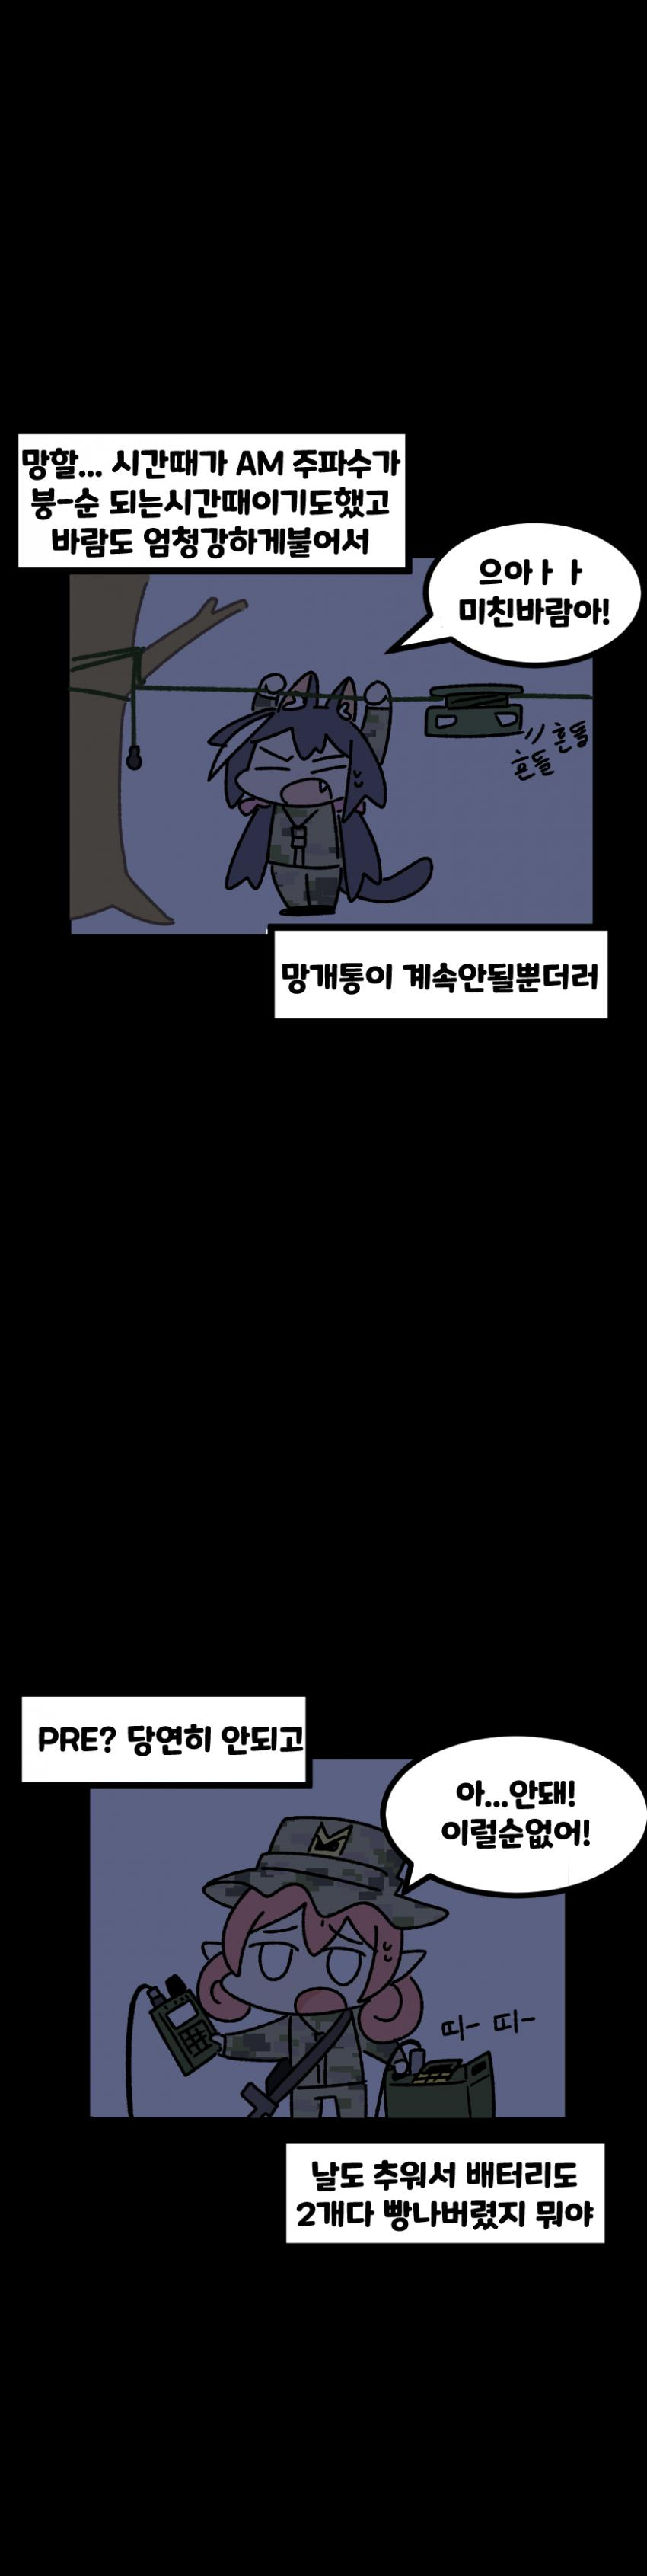 viewimage.php?id=2ebcc232eadd36&no=24b0d769e1d32ca73fec8efa11d02831835273132ddd61d36cf617d09f43d54cff8b7278954ea96a93bf9ab3dcb07cadf07e8de445b905a016213d9e54ee3ce396